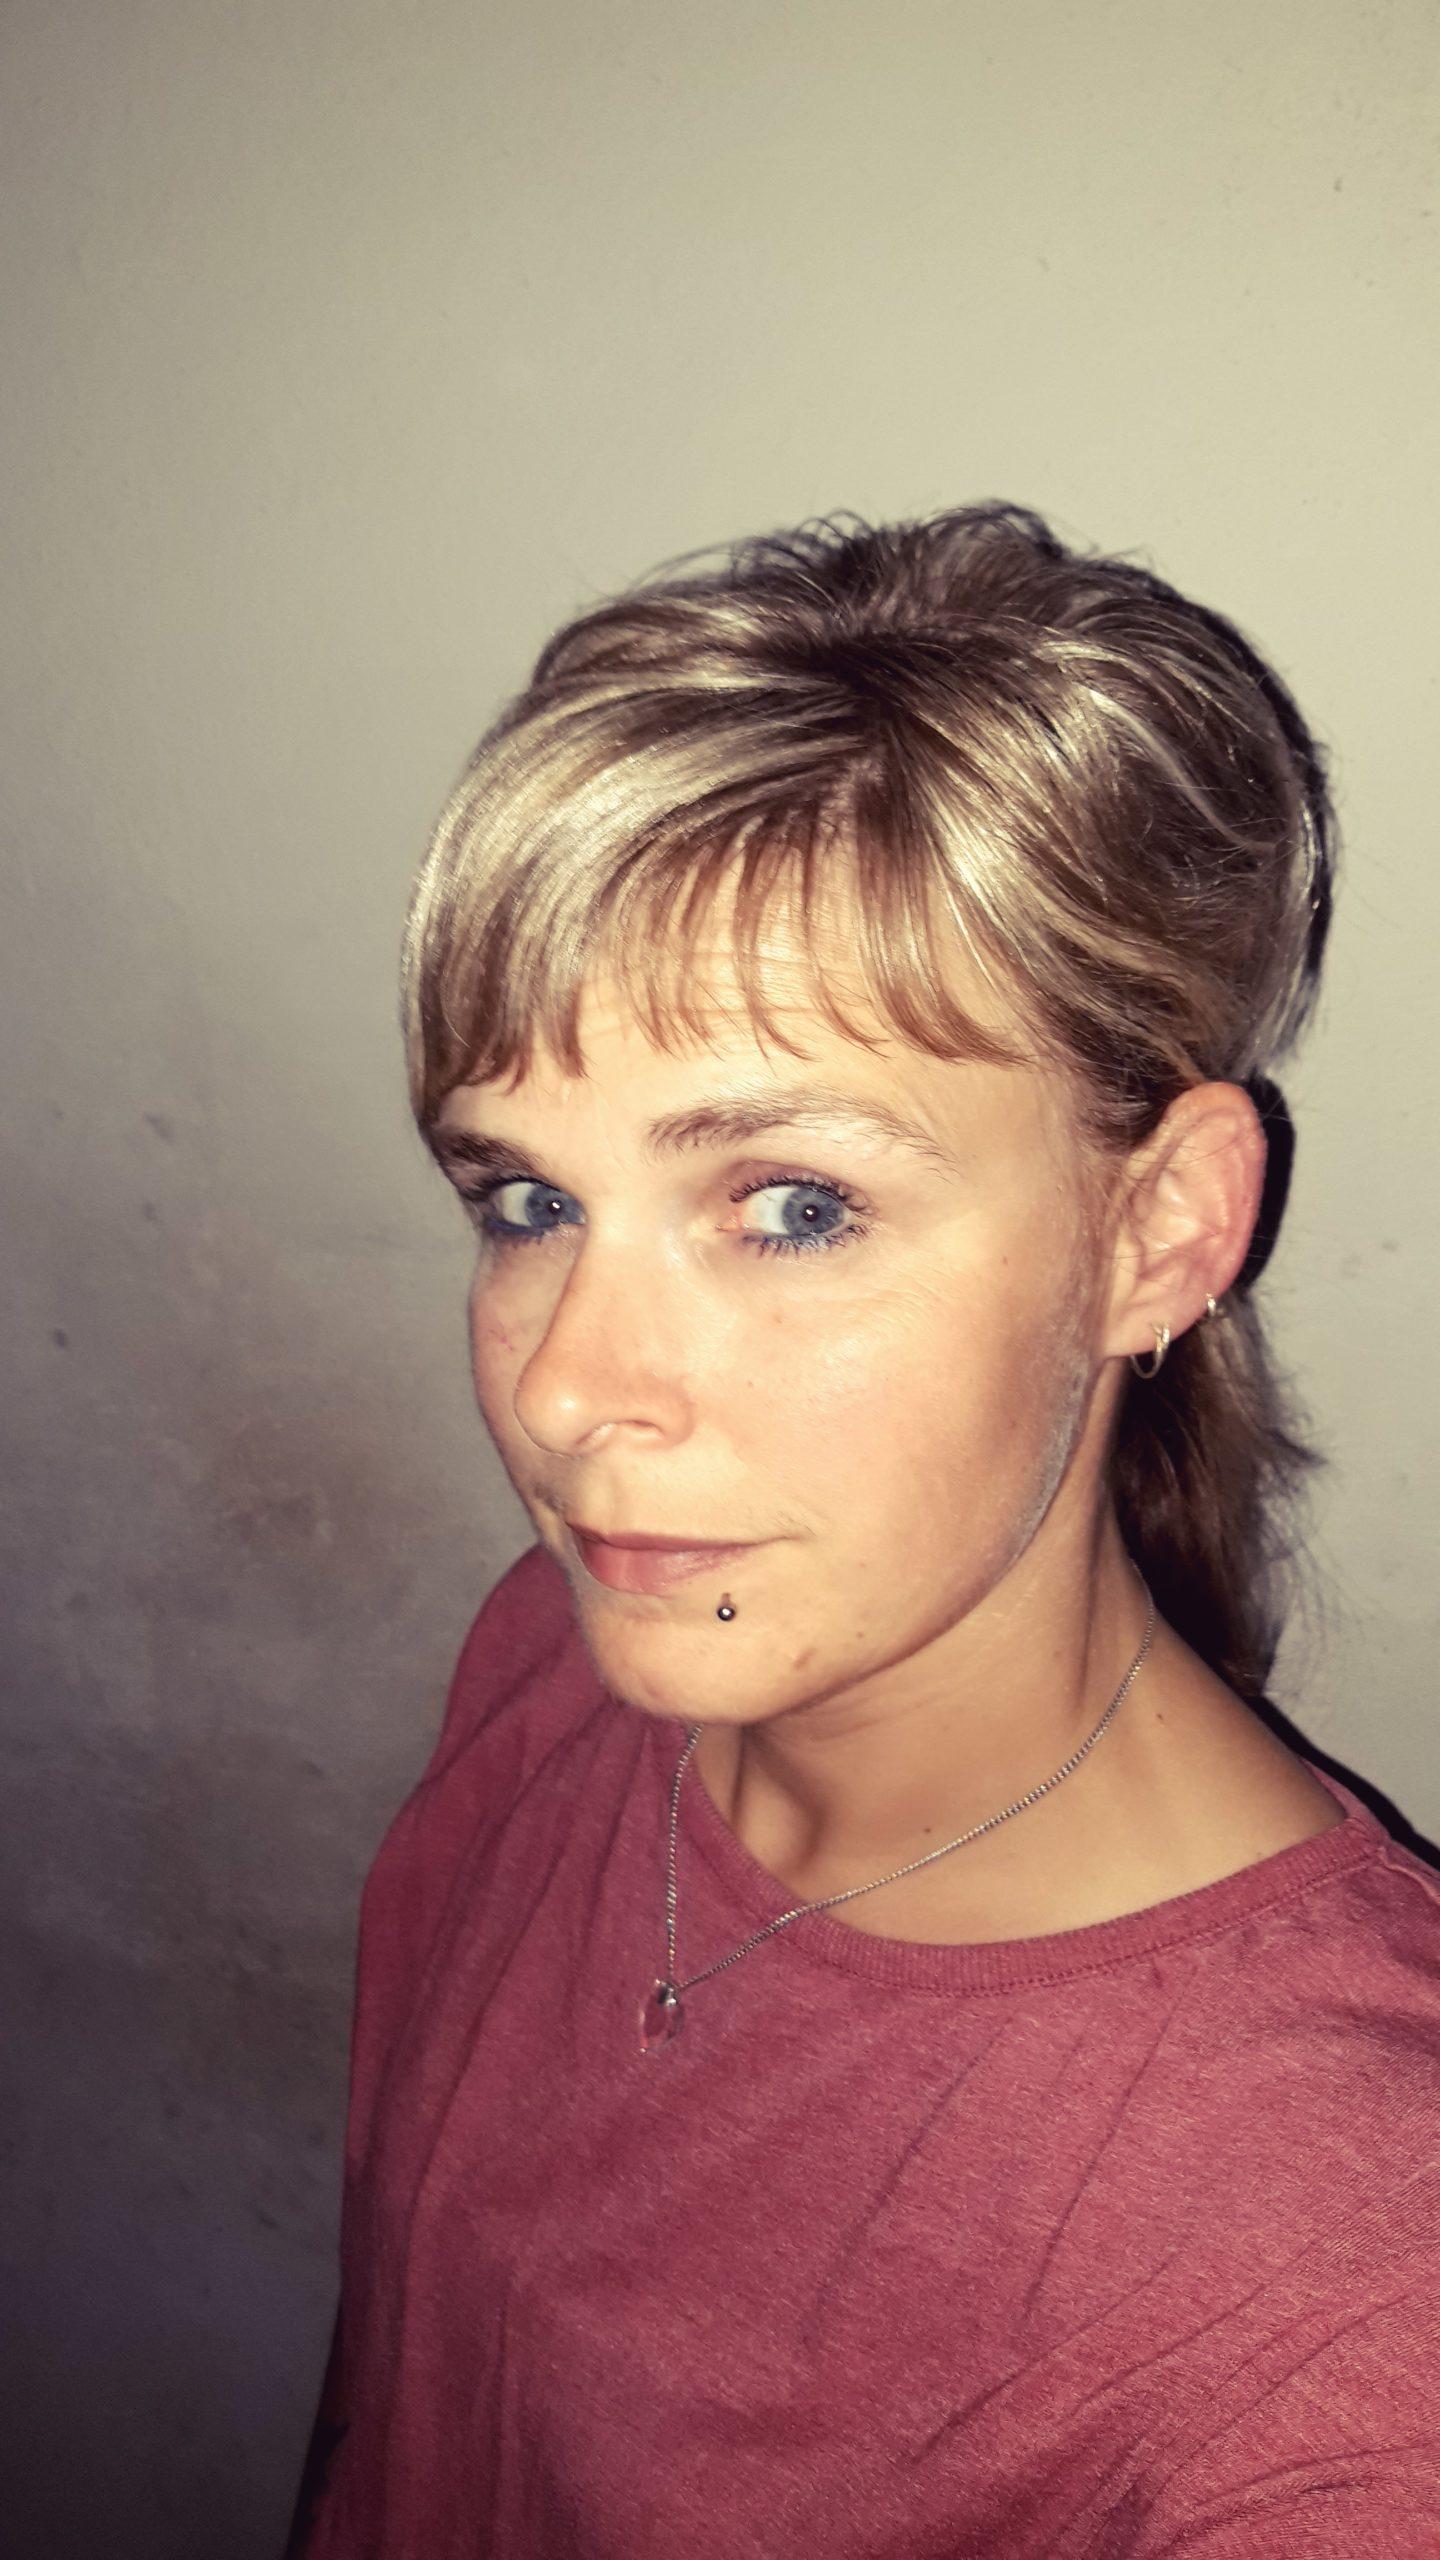 Diana Jähne